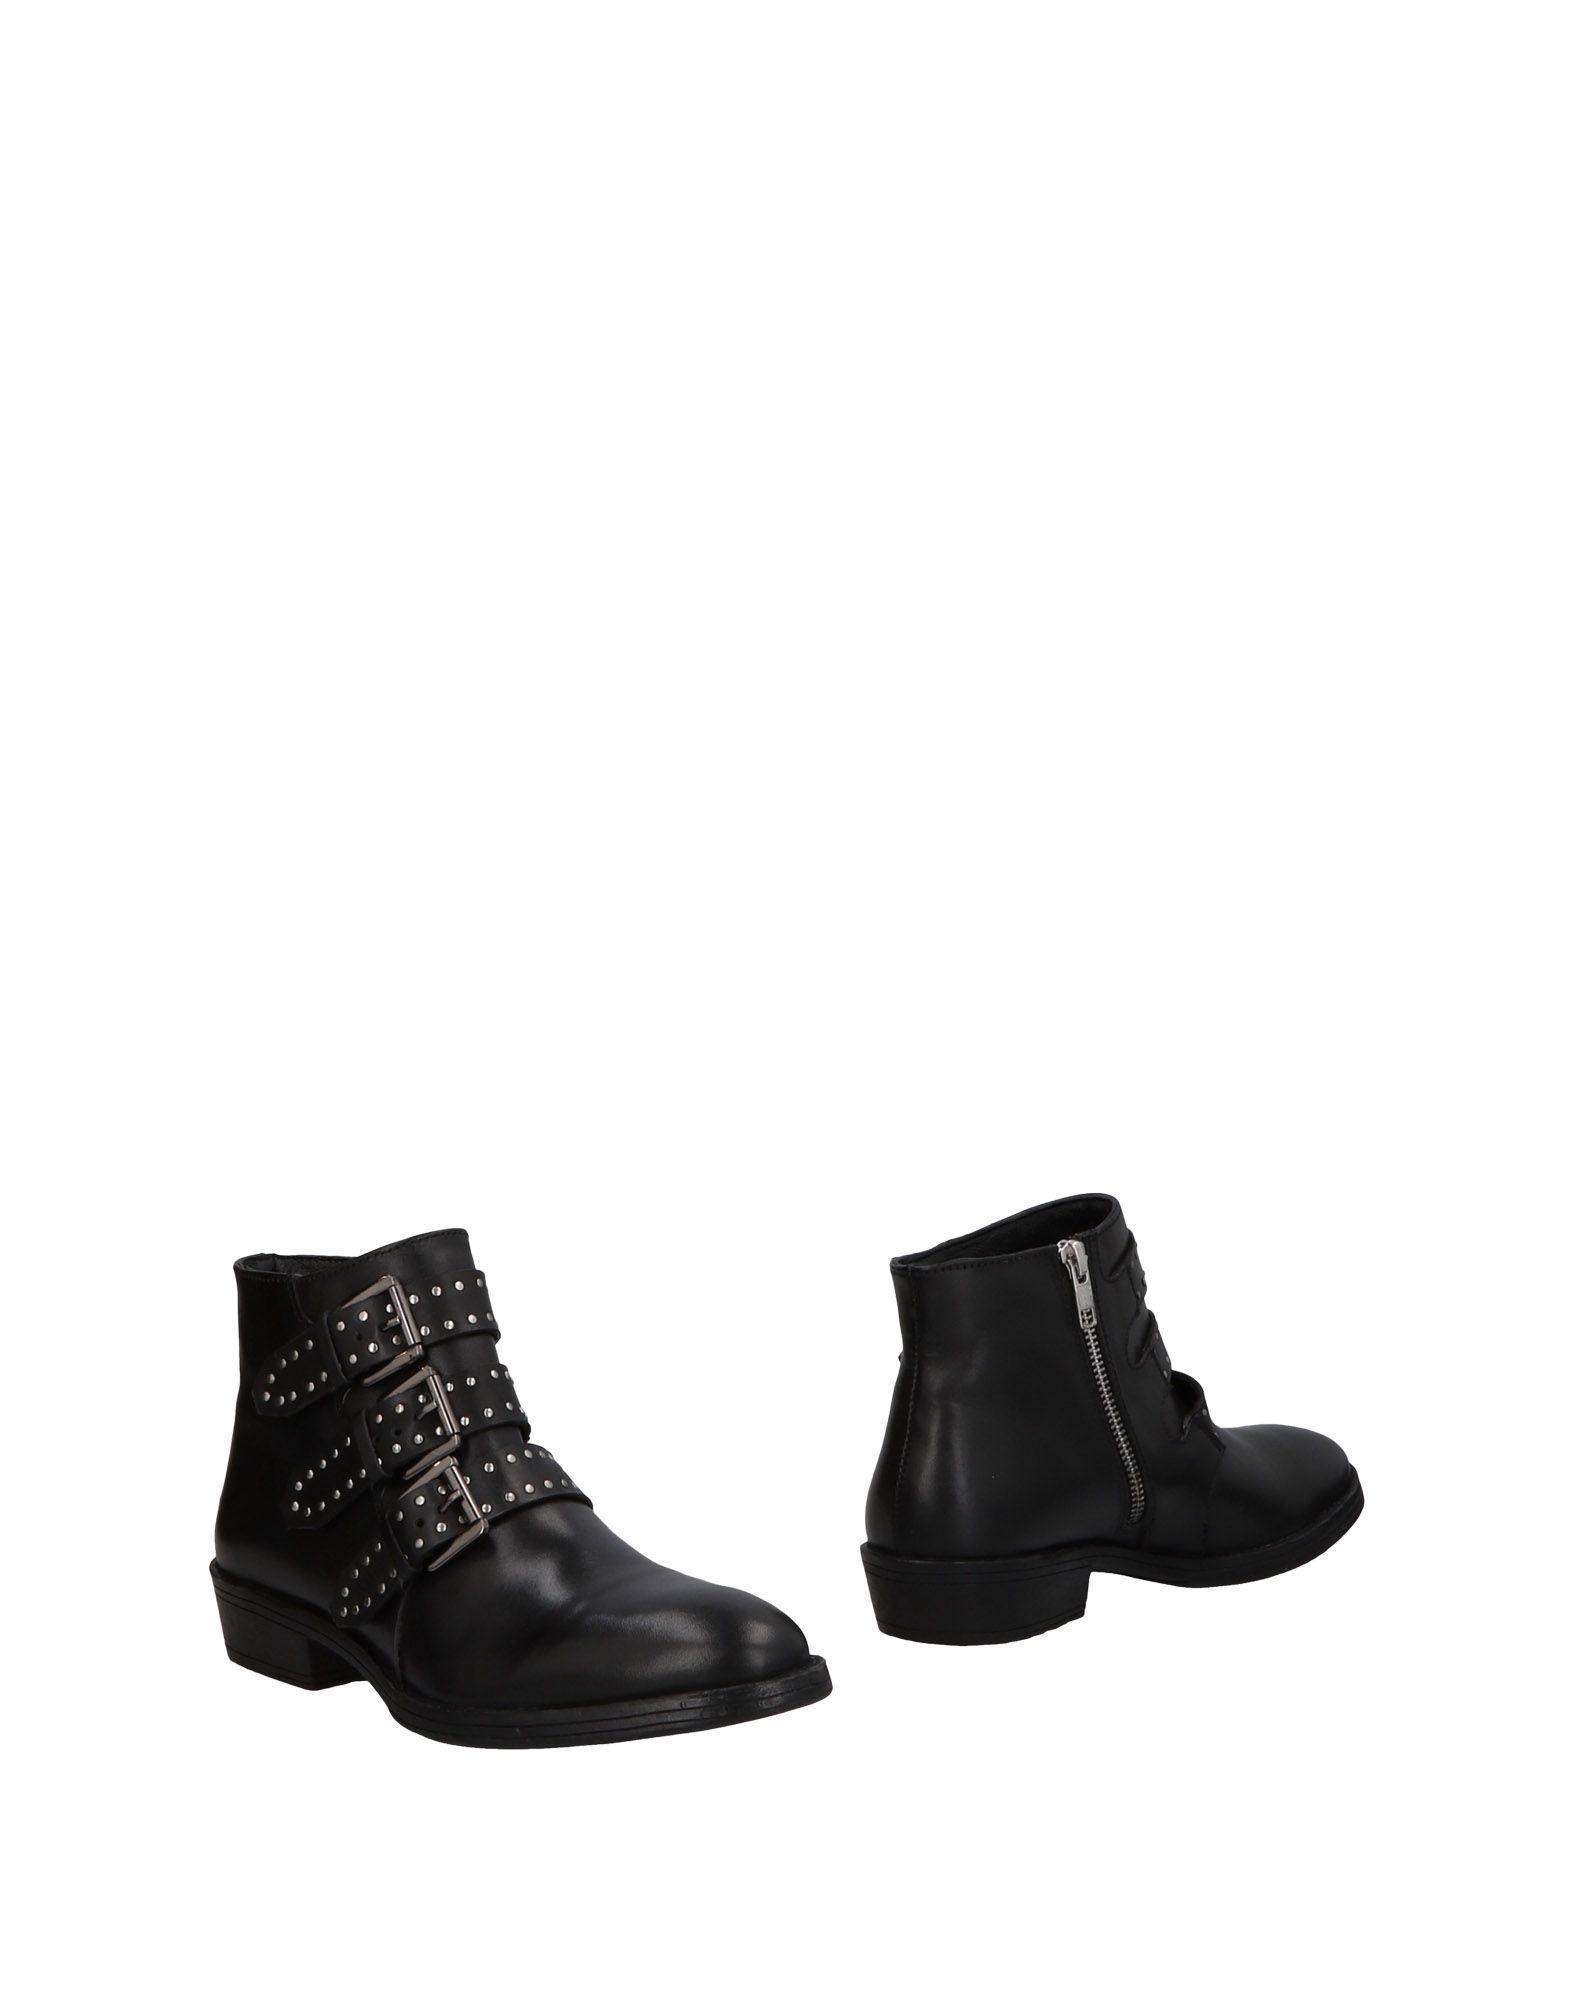 Le 11467970QHGut Blanc Stiefelette Damen  11467970QHGut Le aussehende strapazierfähige Schuhe 6cedda